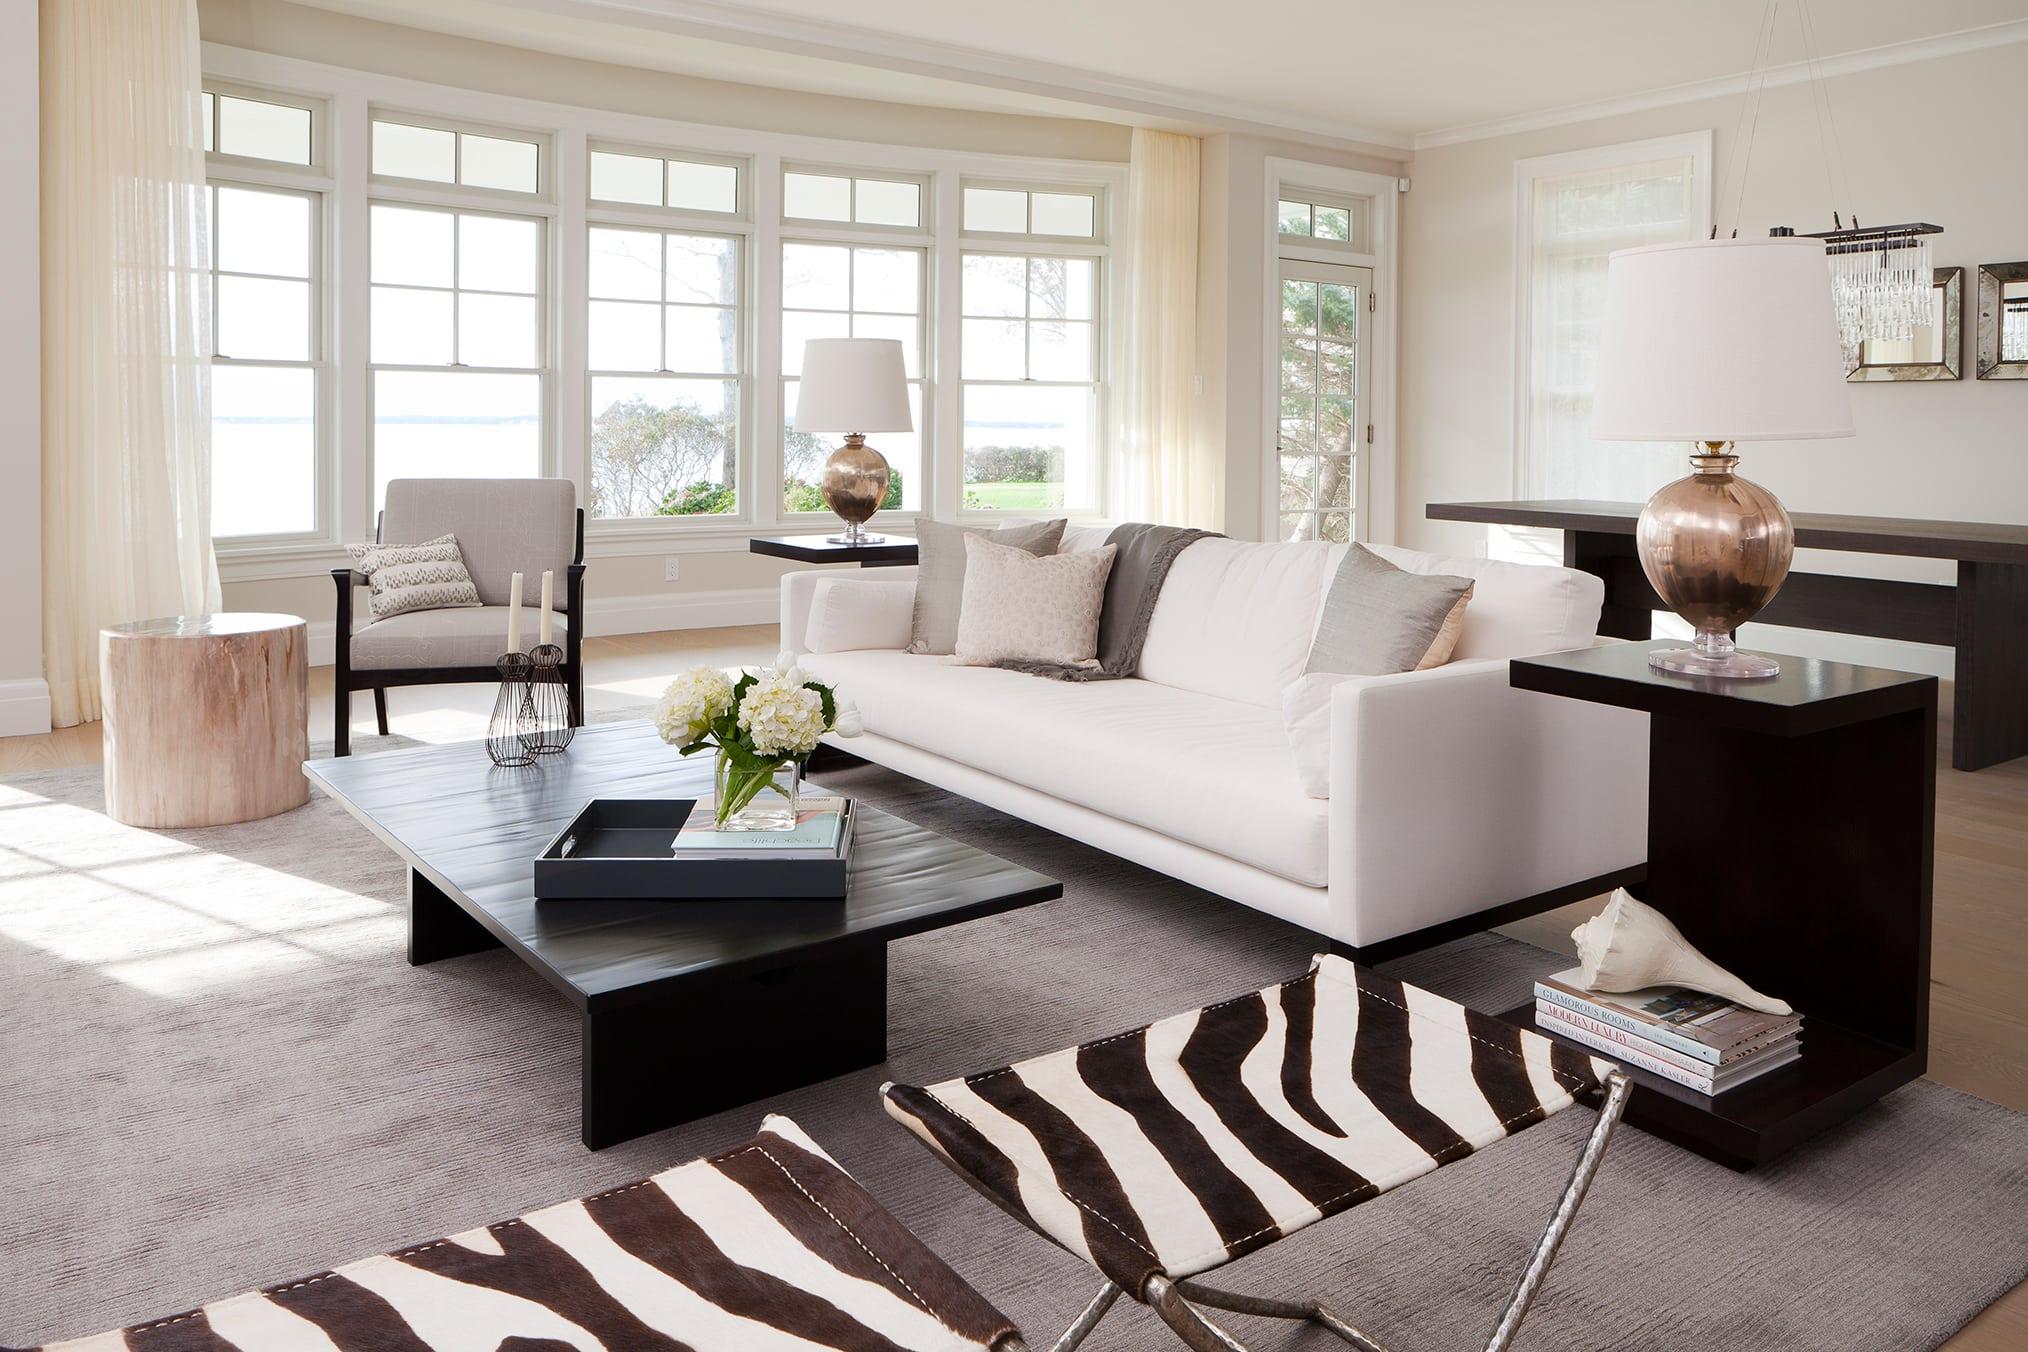 purvi-padia-interior-design-northfork1